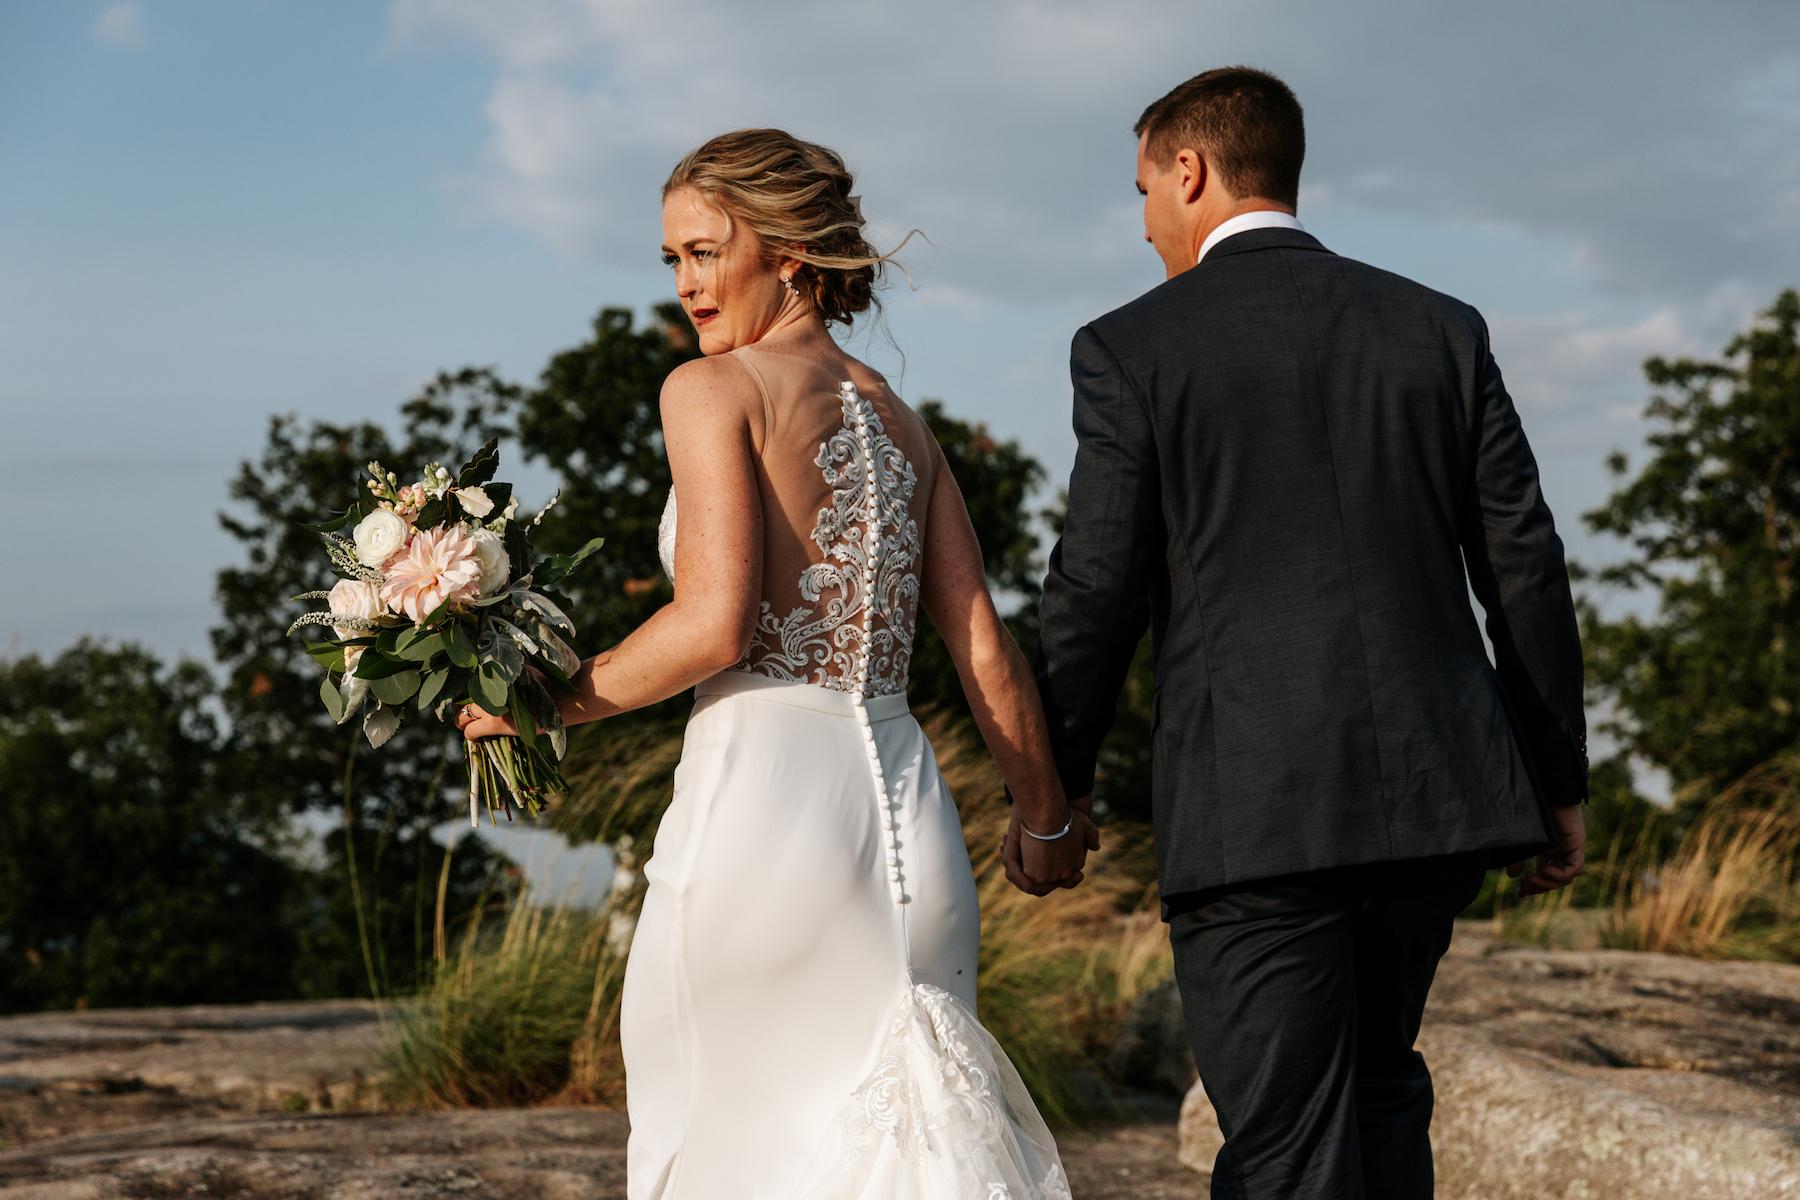 wedding-engagement-photographer-spartanburg-greenville-columbia-carolina-south-north-522.JPG